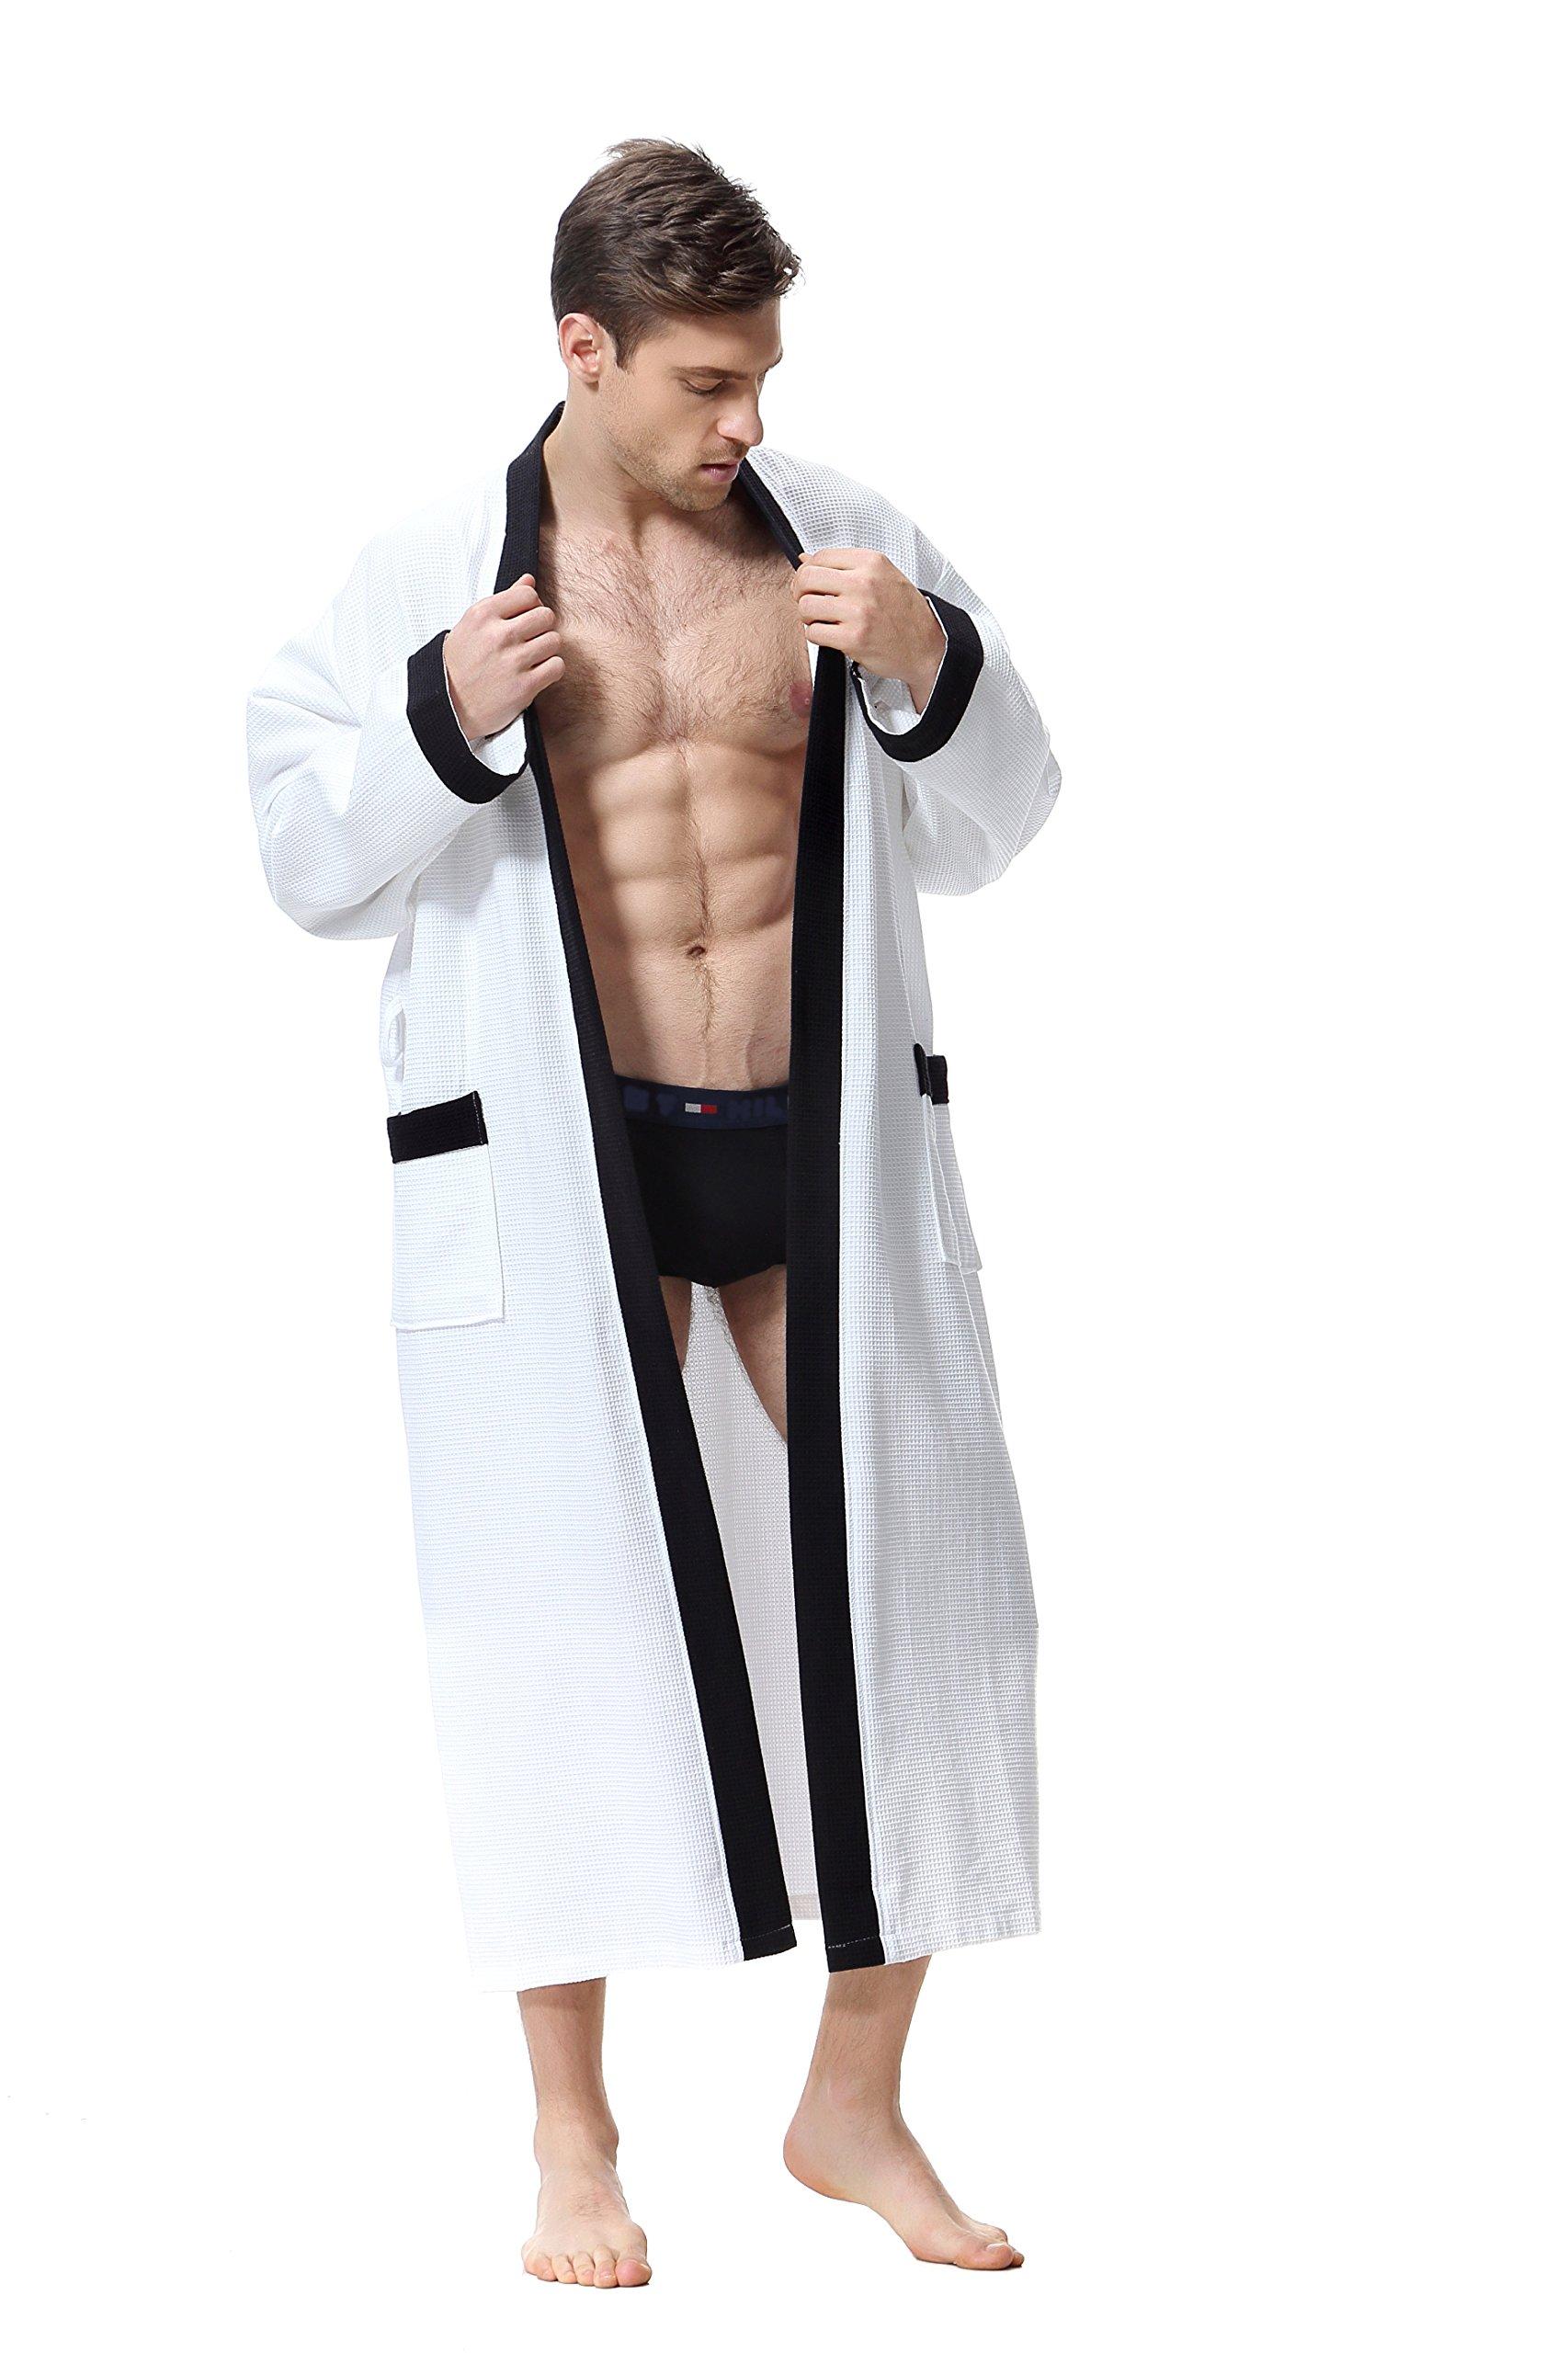 OUFANG Men's Robe - White/Black Kimono Waffle Spa Bathrobe, Over Knee Length Unisex (Medium)